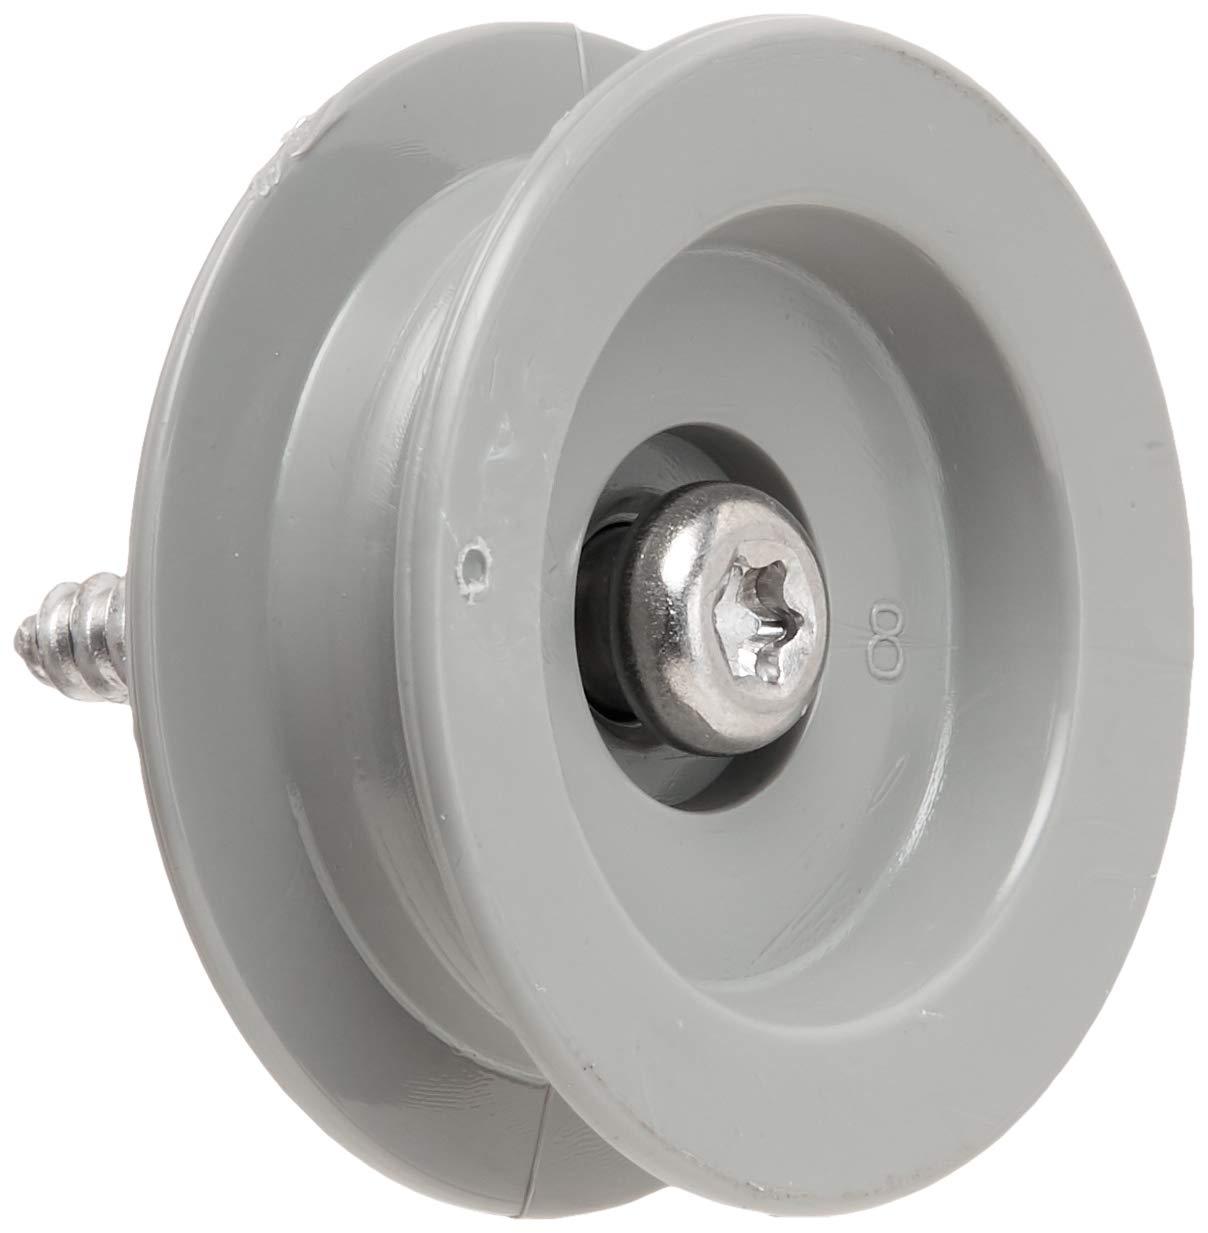 Frigidaire 5304507405 Dishwasher Dishrack Support Roller Assembly Original Equipment (OEM) Part, White by FRIGIDAIRE